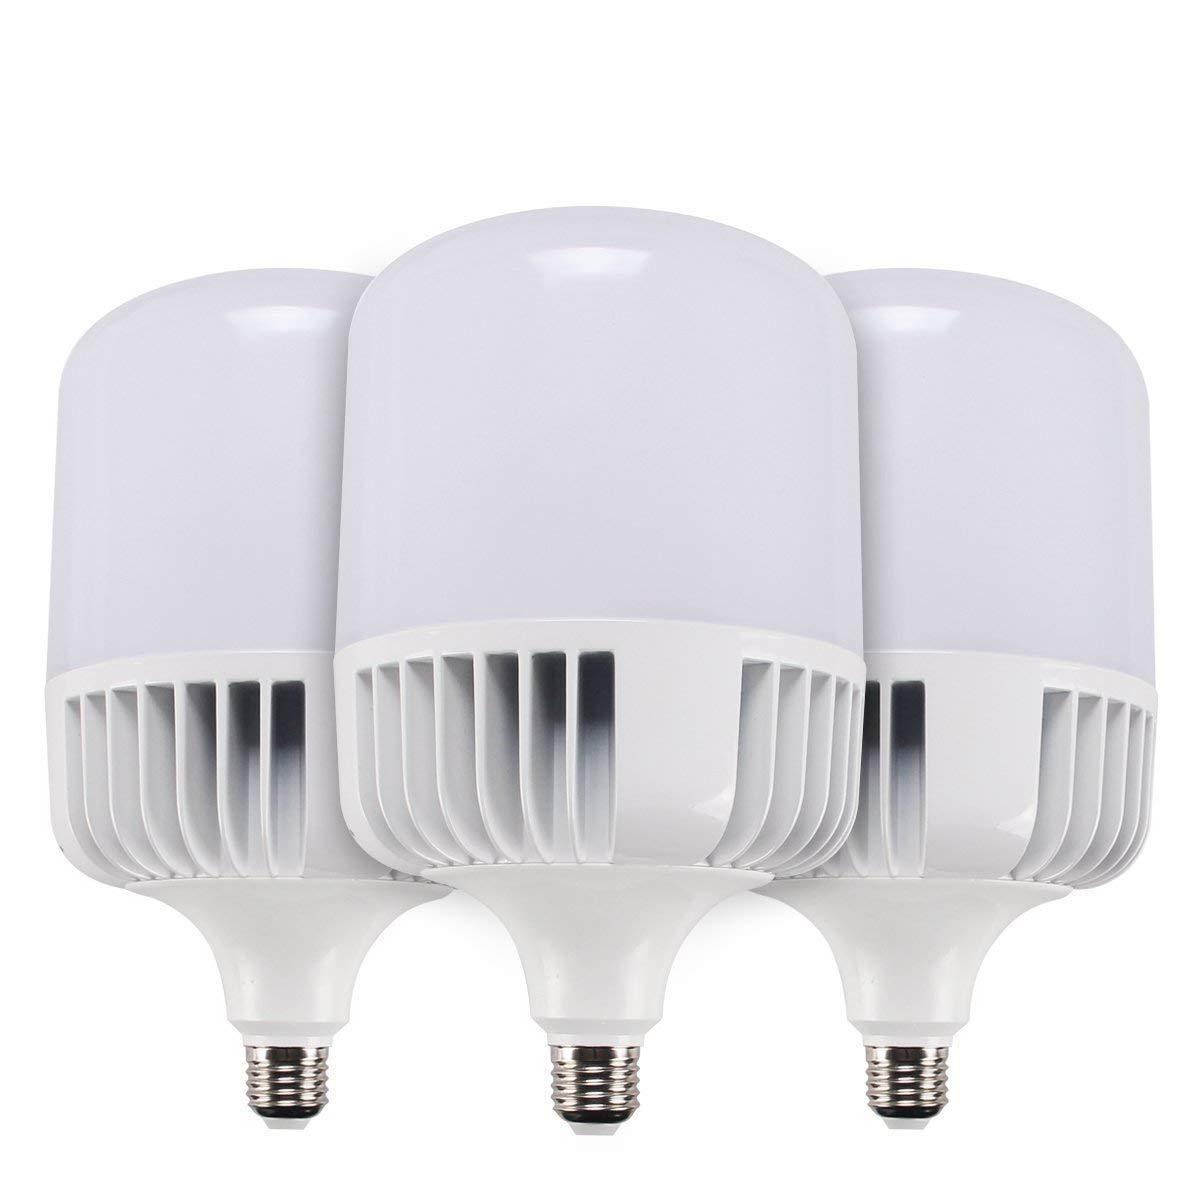 SUNTHIN (3-Pack) Daylight LED Bulbs, 5500K, 4000LM, 300W Replacement, Yard Light Bulb, LED Corn Light Bulb